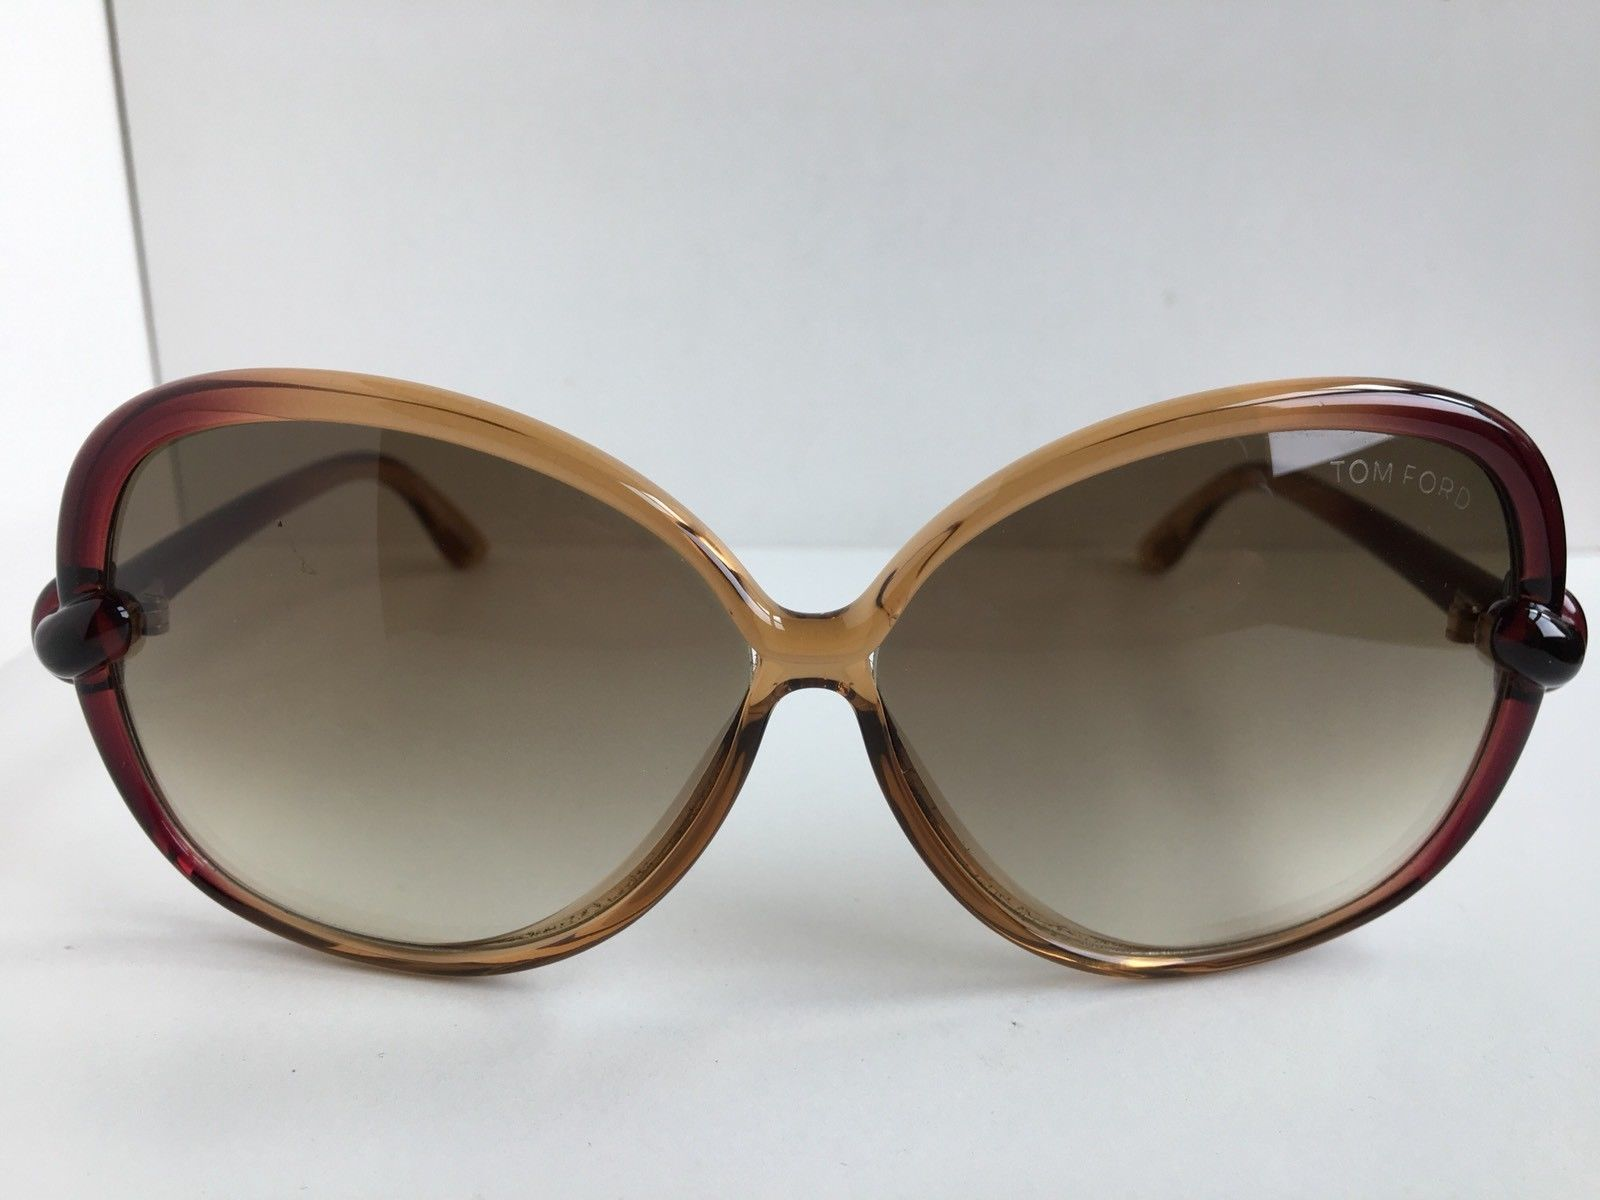 dfe08376d0 New Tom Ford Ingrid TF 163 TF163 71F 62mm Amber Oversized Women s Sunglasses